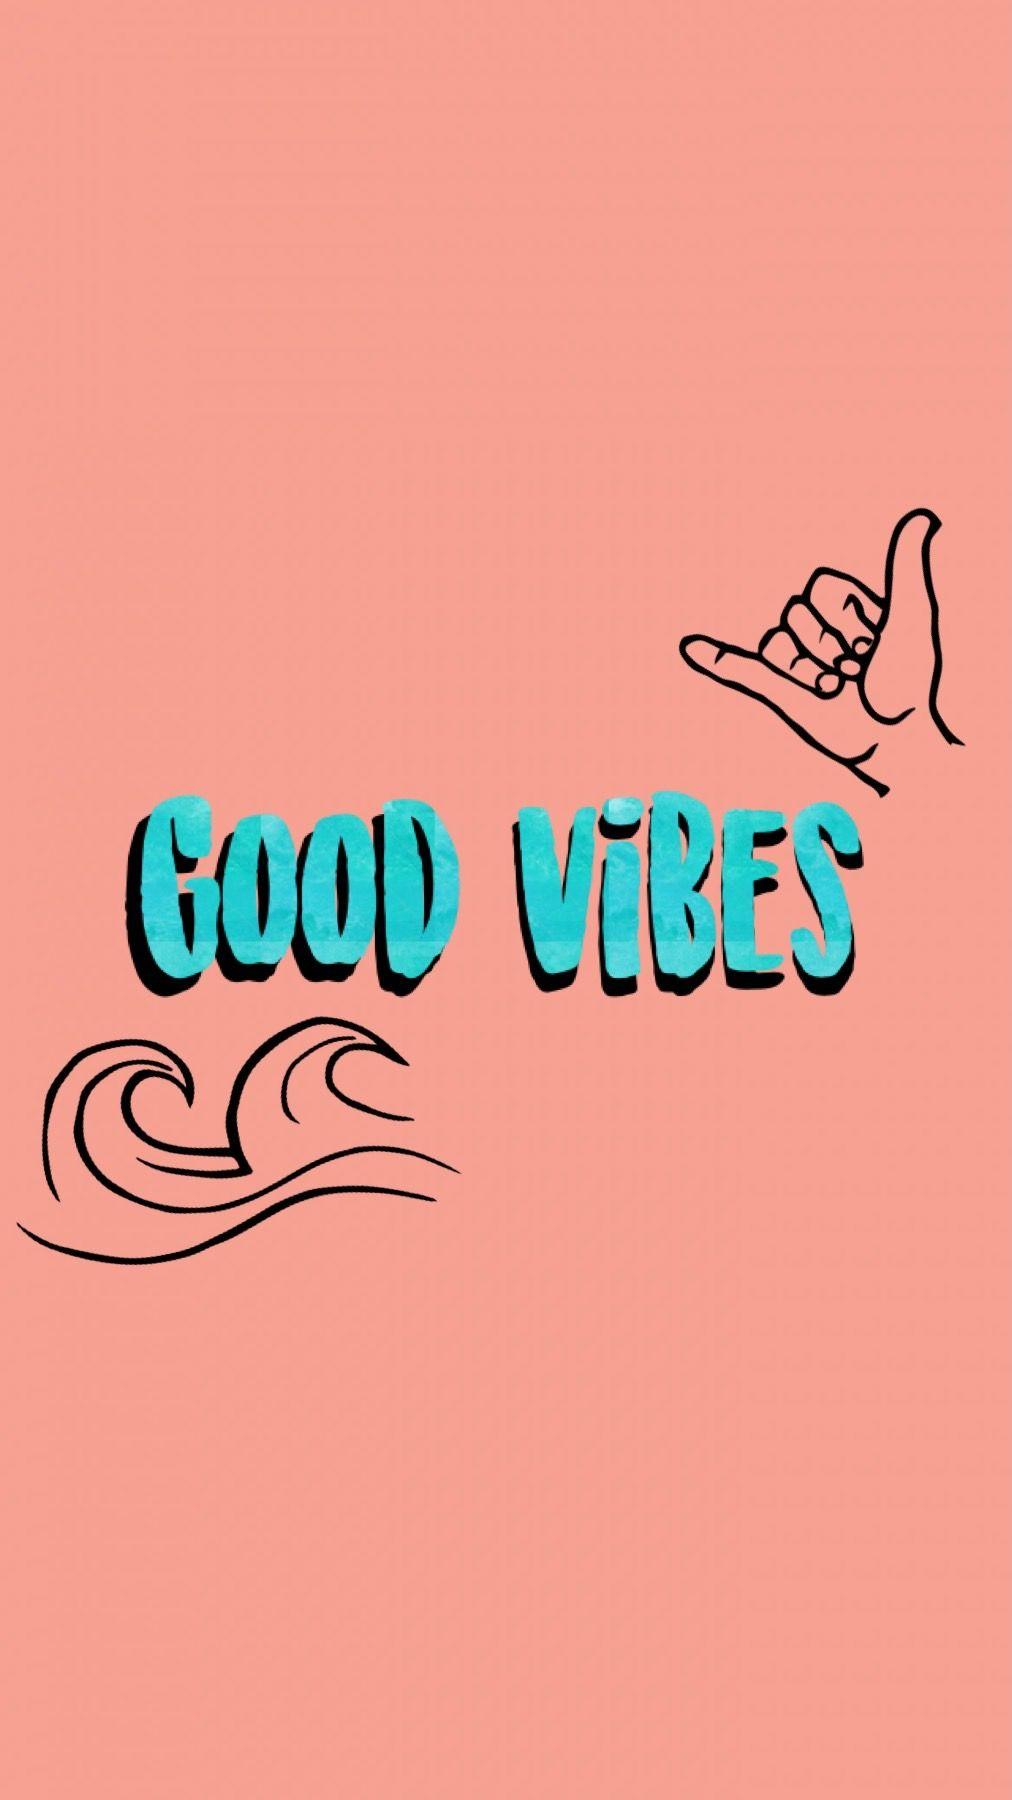 Good Vibes Phone Wallpaper Quotes Wallpaper Good Vibes Wallpaper Cute Wallpapers For Ipad Positive Quotes Wallpaper